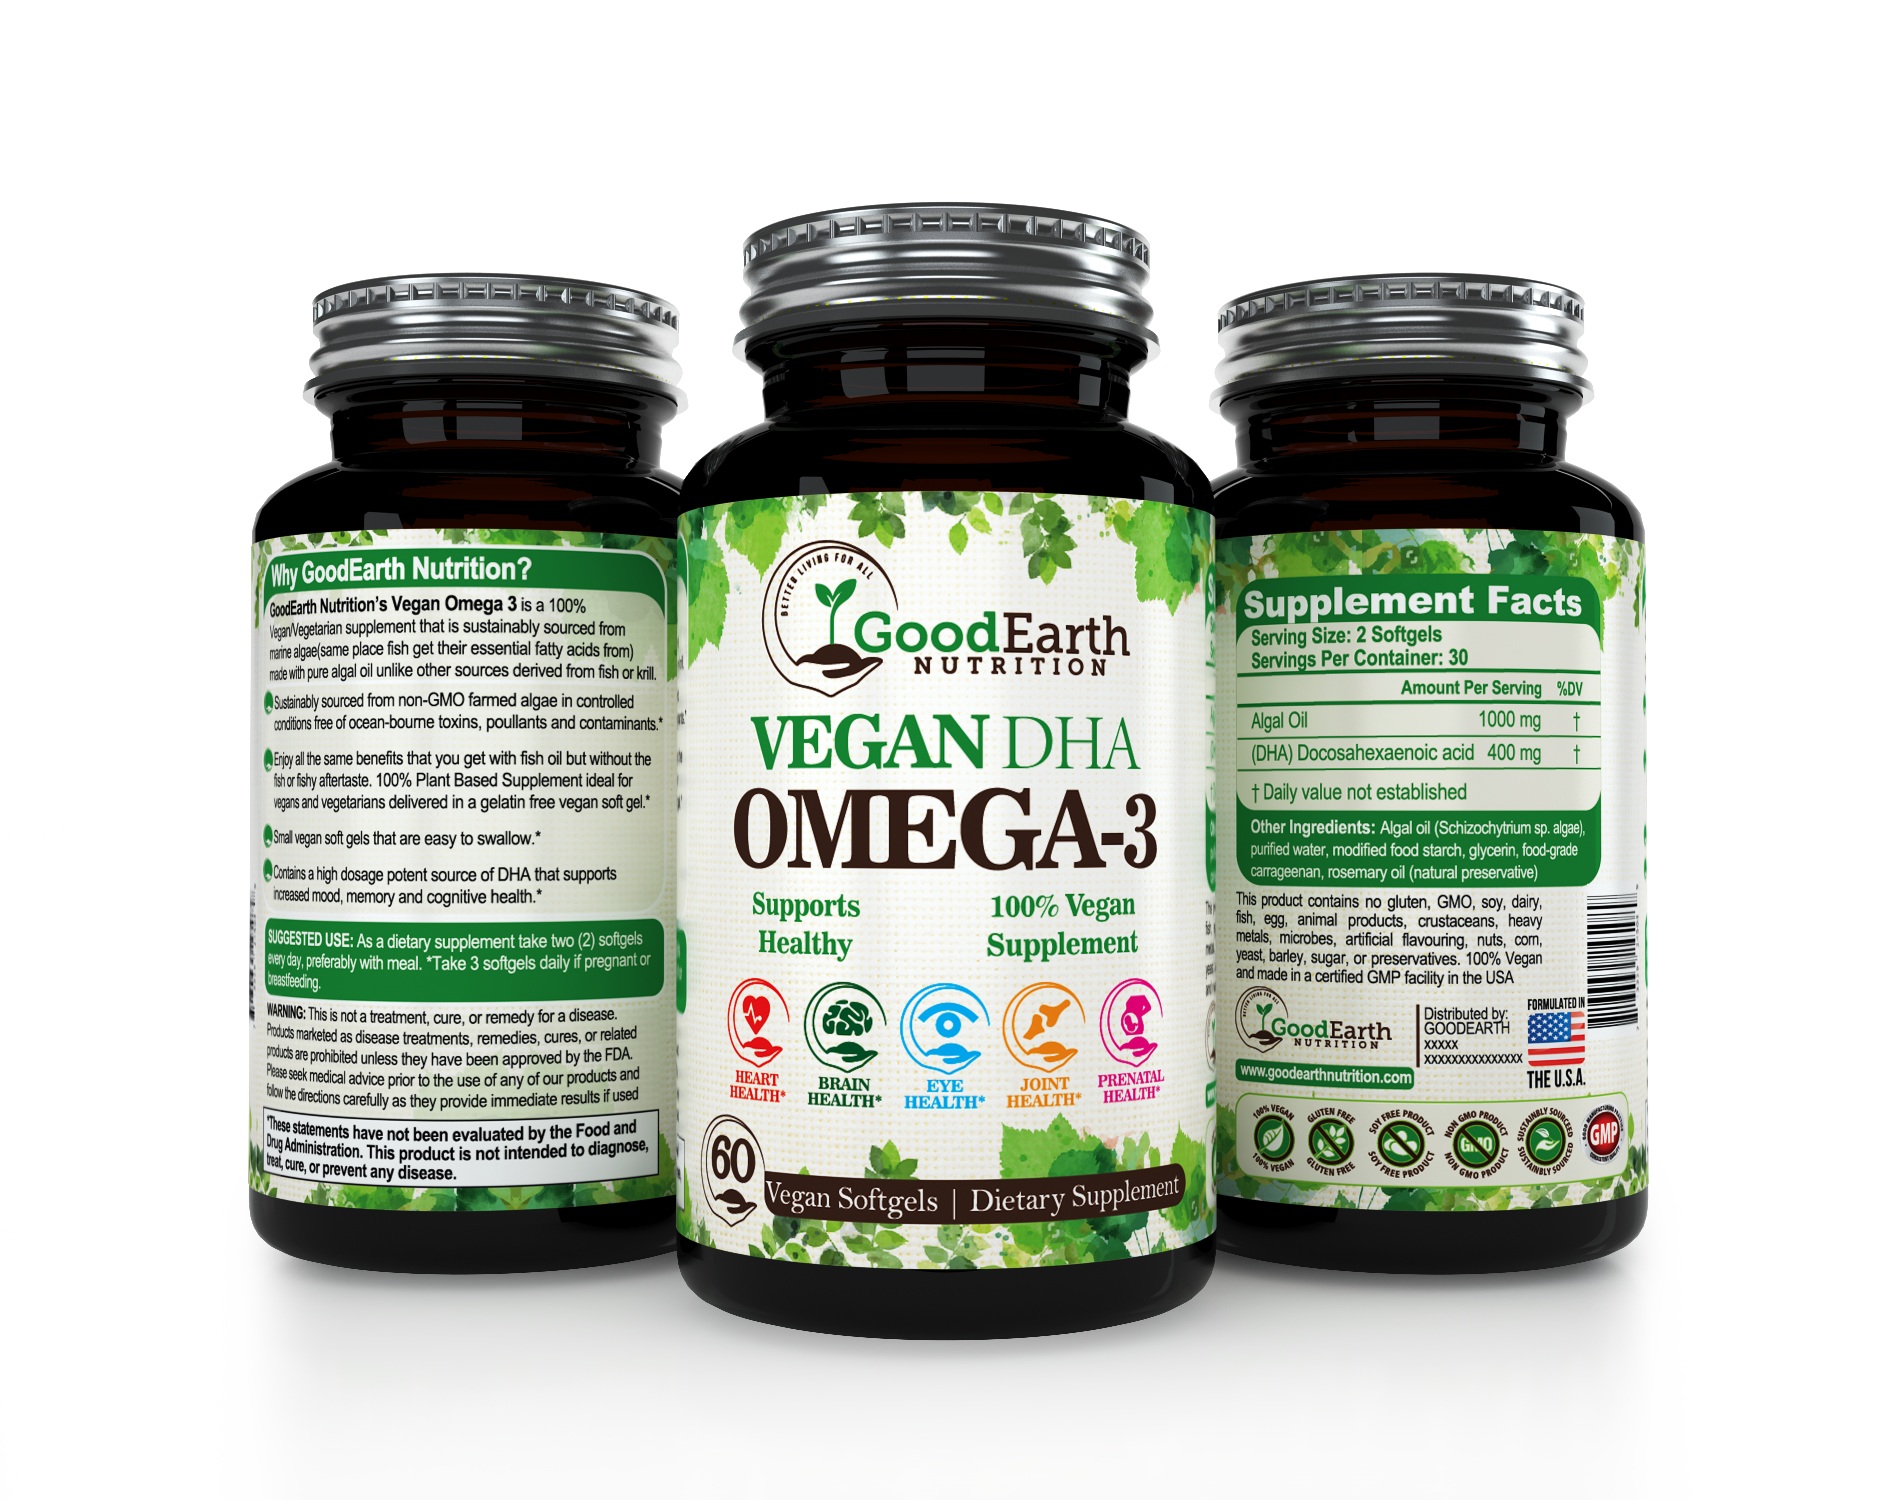 Vitamin Supplement Label(for bottle)